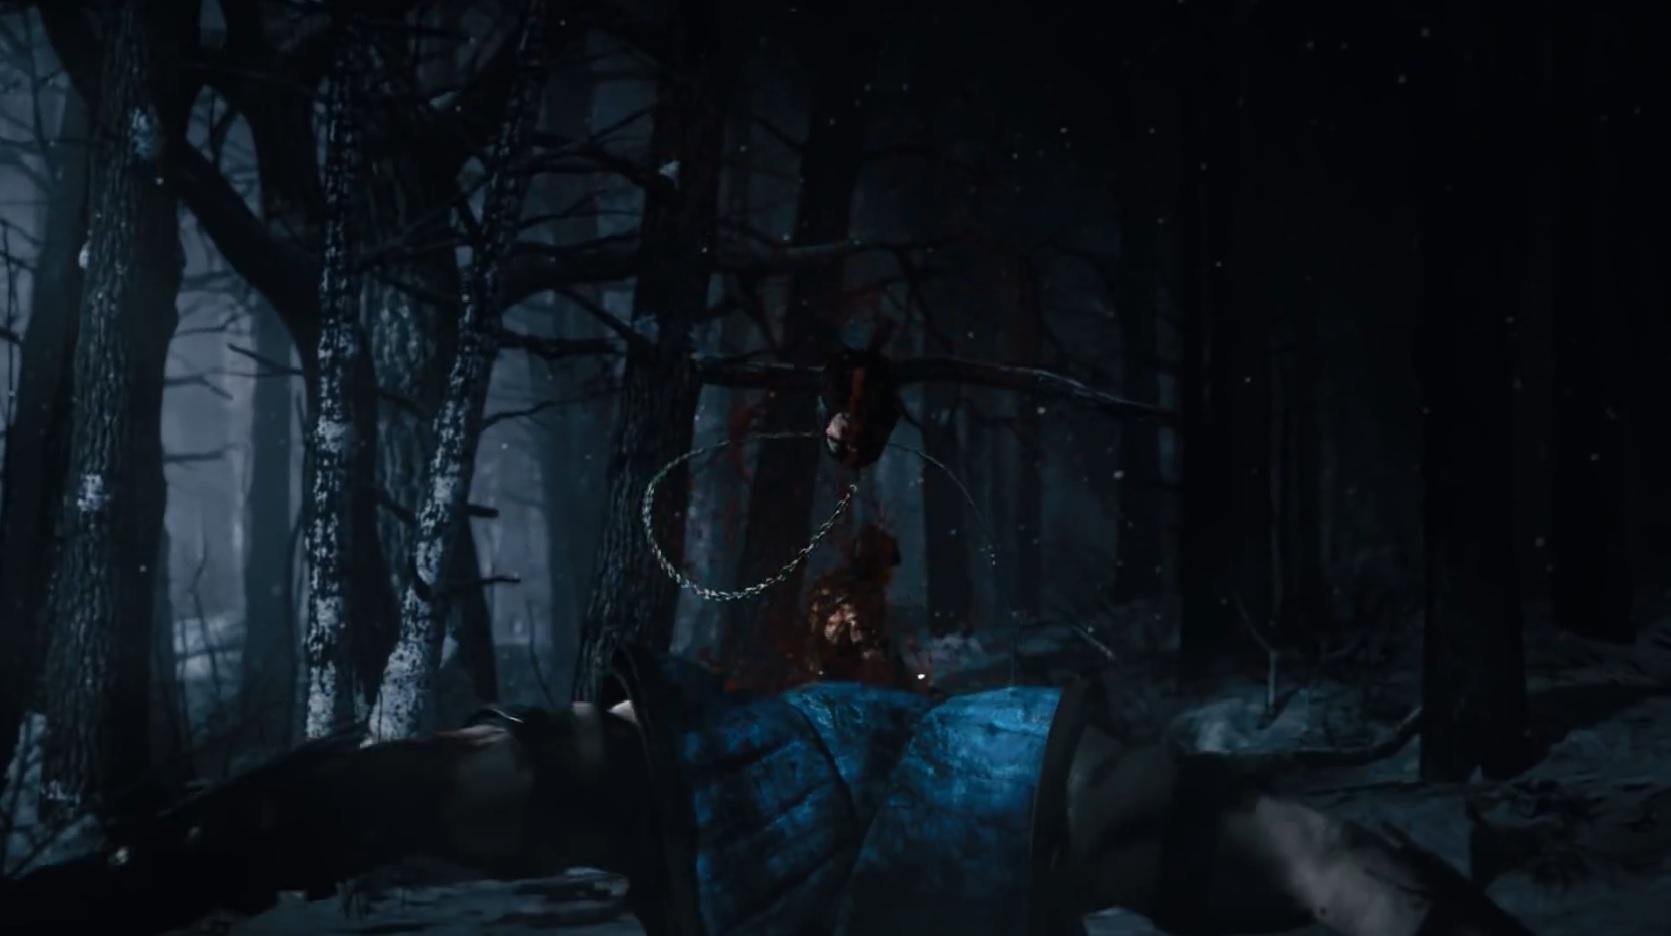 Mortal Kombat X Fatality Scorpion Spear Beheading Trailer Screenshot